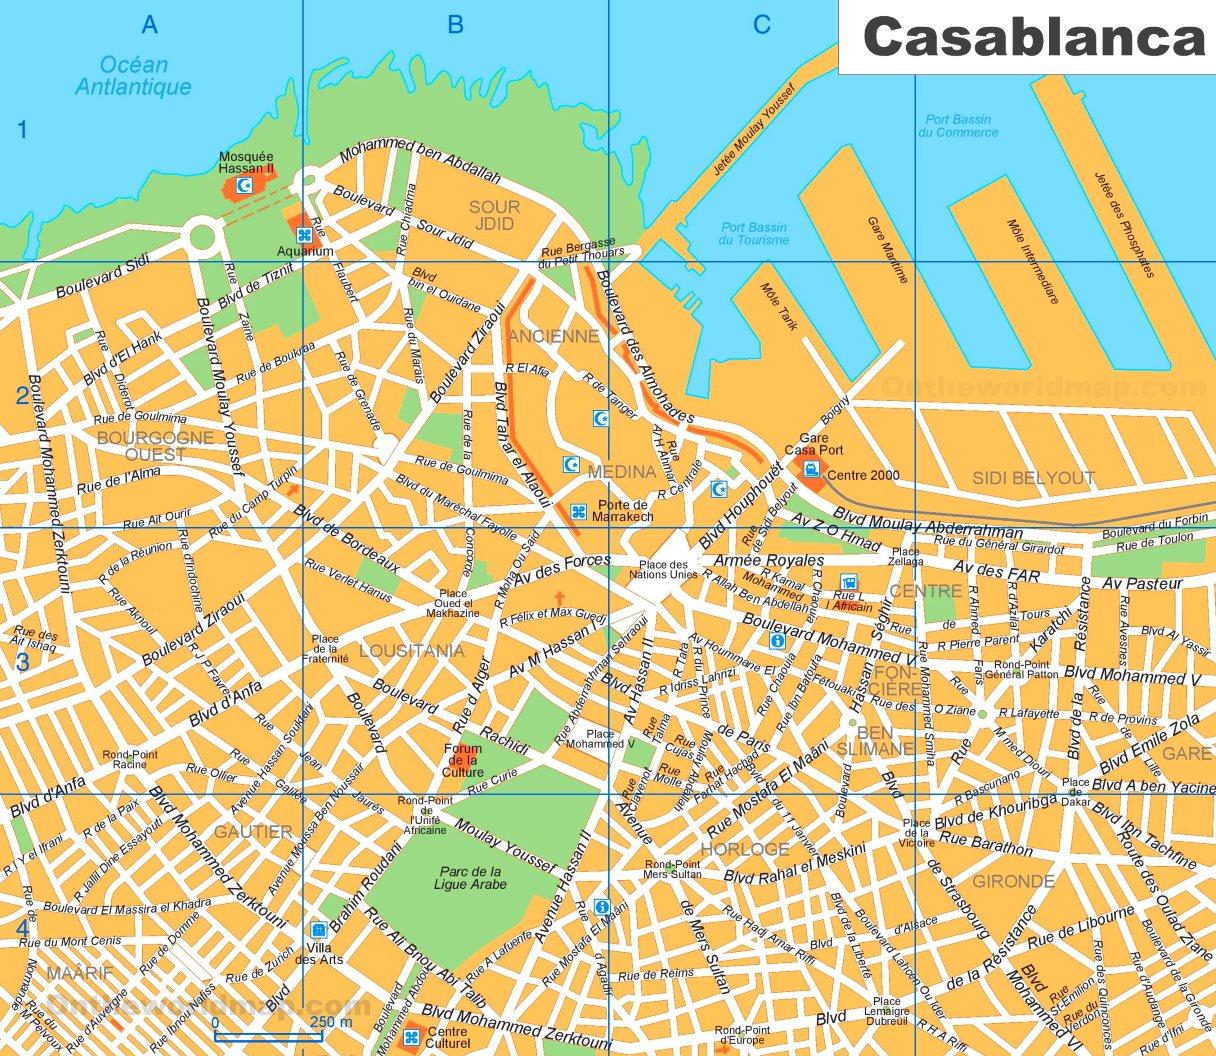 Casablanca sightseeing map on johannesburg map, key largo map, algeria map, timbuktu map, potsdam map, dubai map, morocco map, tripoli map, western sahara map, marrakesh map, marrakech map, africa map, algiers map, dar es salaam map, cape town map, damascus map, accra map, salerno map, oran map, lima map,